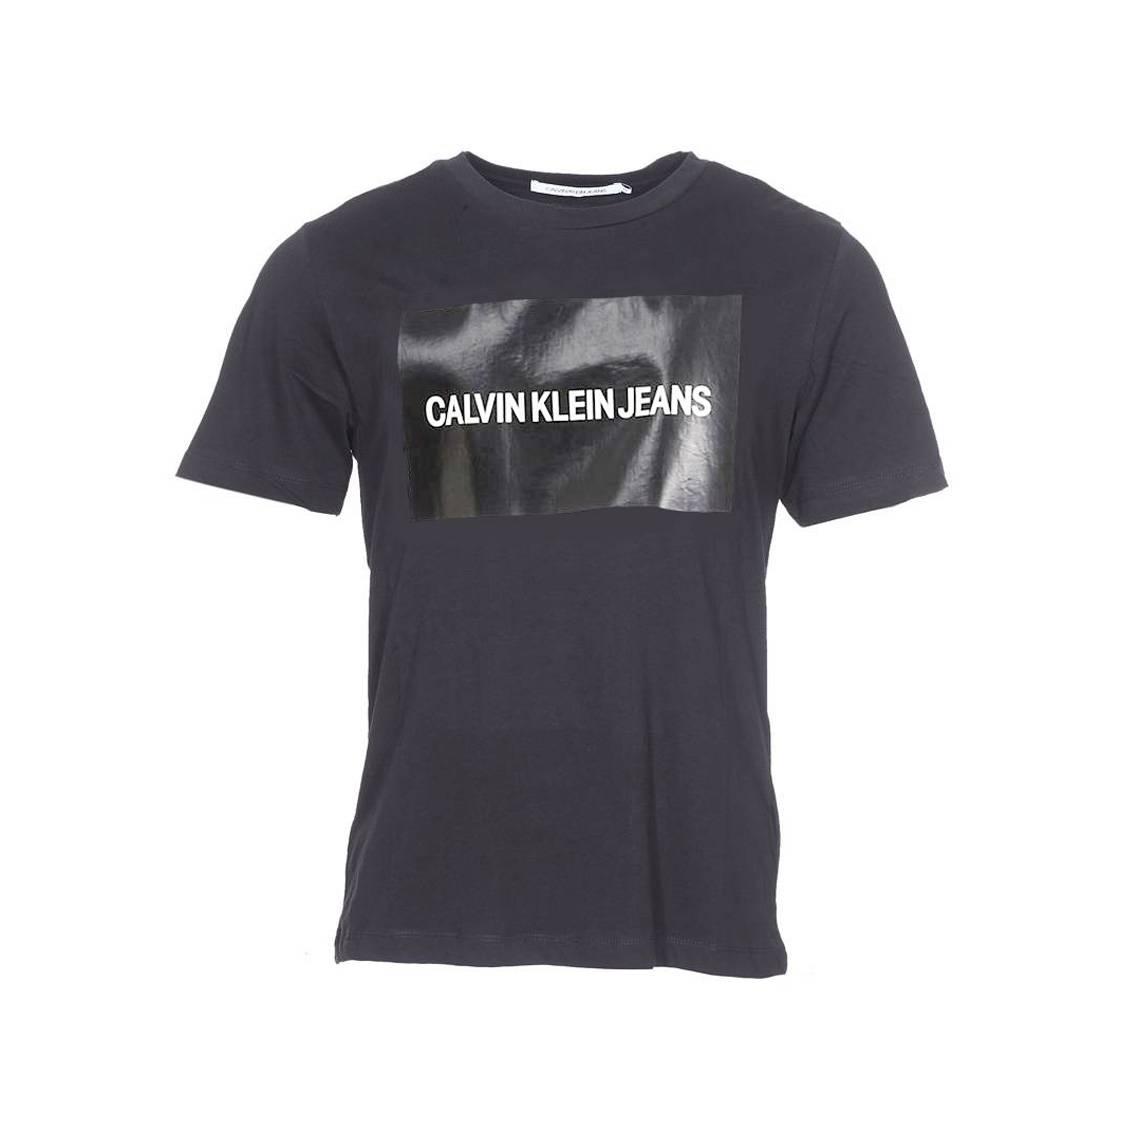 Col Un Coton Noir Institutional Rond En Avec Klein Tee Logo Jeans Calvin Shirt Box v5FxqO